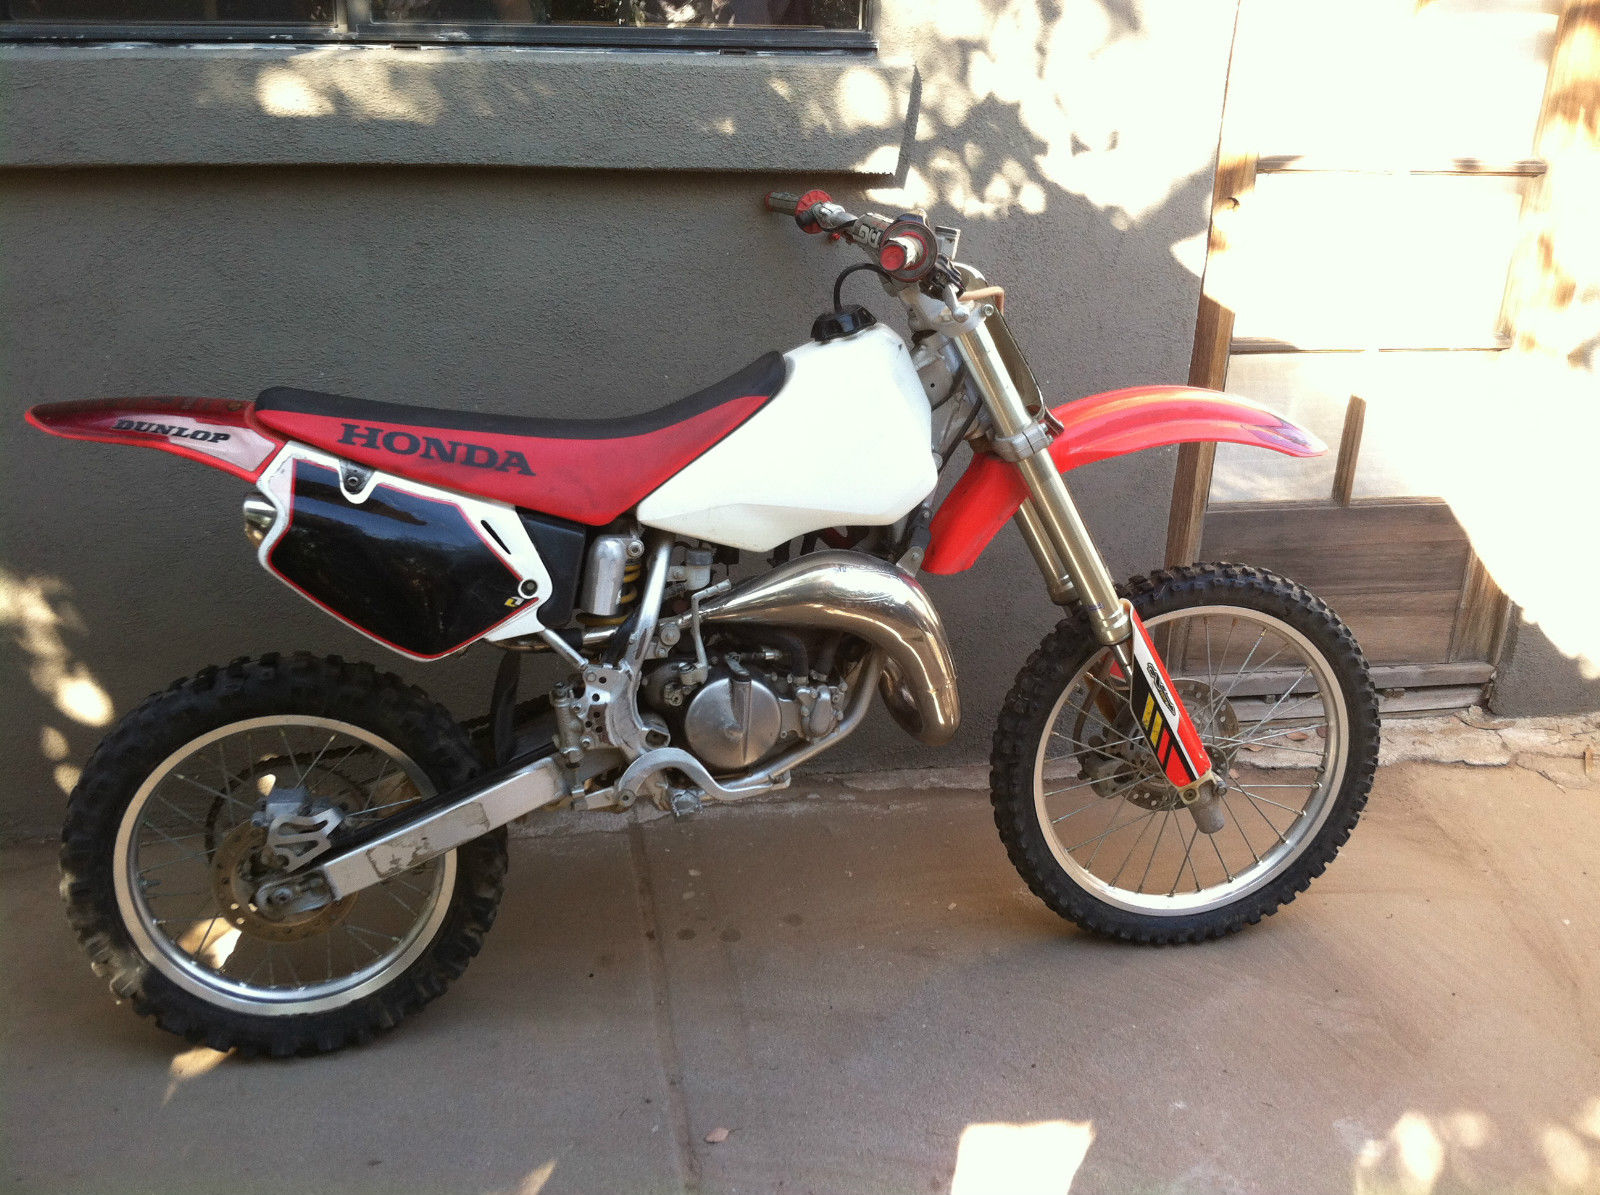 Honda Crf 80 >> Honda CR 80 RB EXPERT Big Wheel Dirt Bike